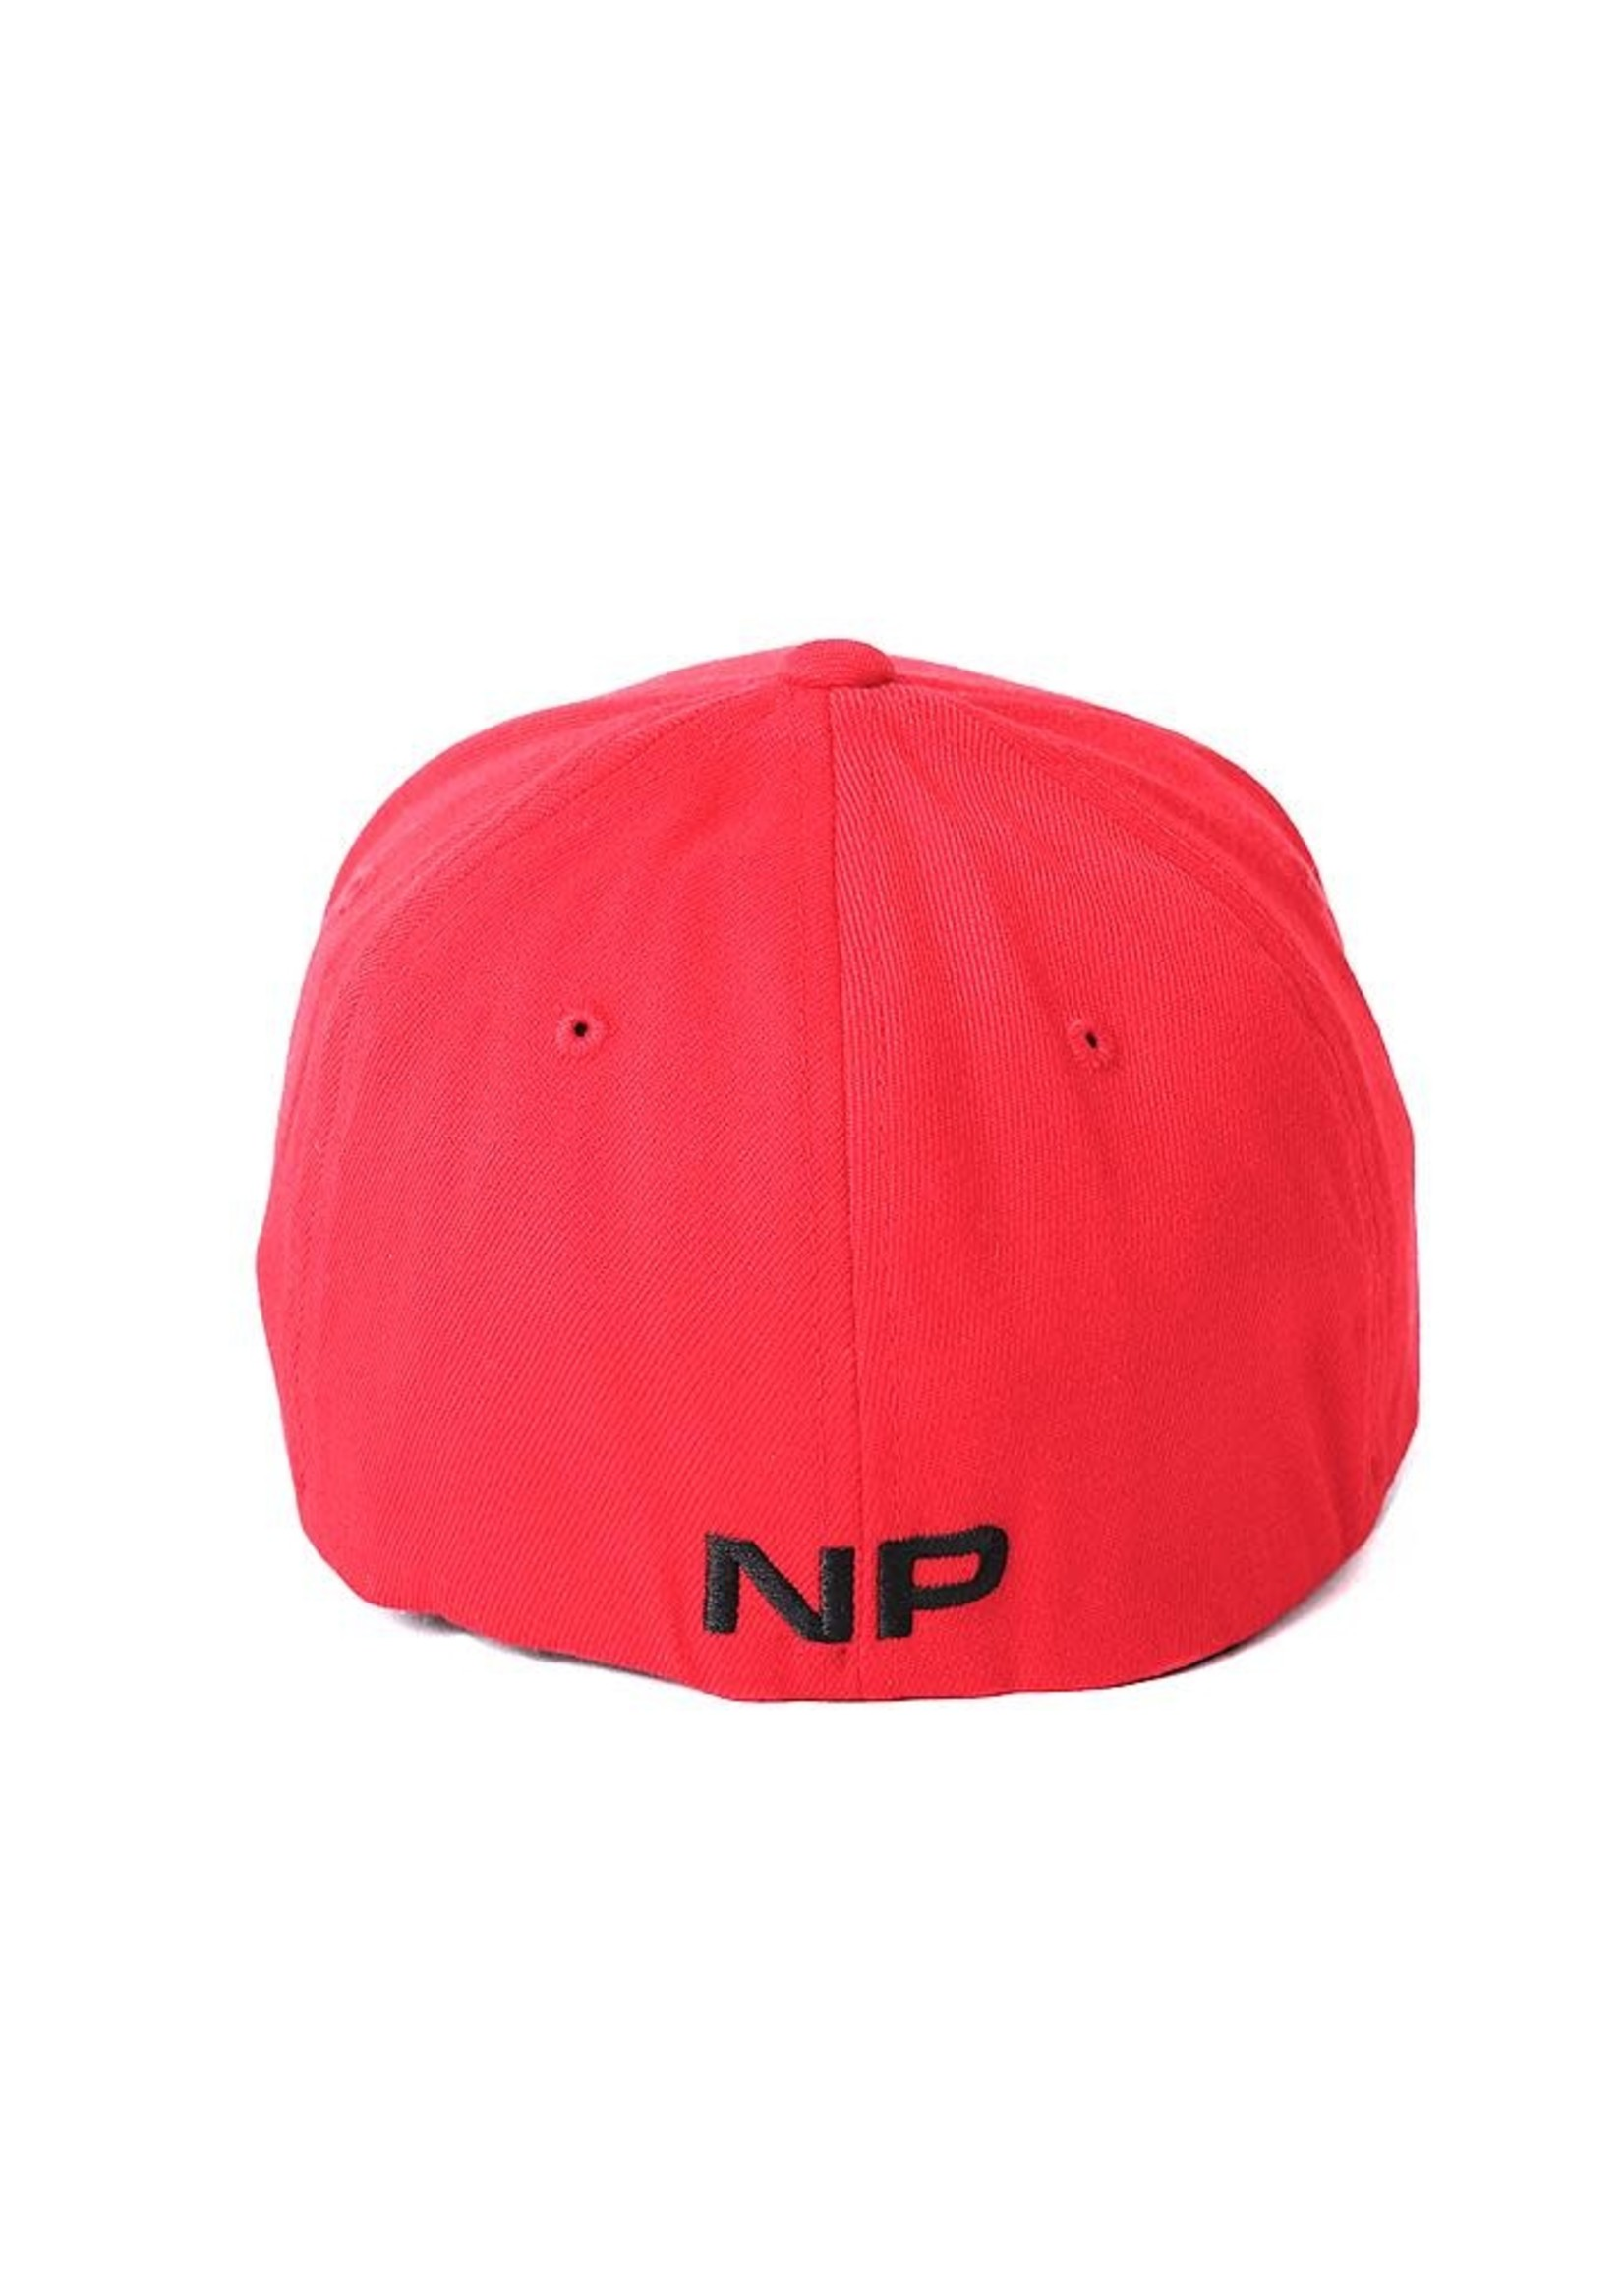 Nasty Pig Nasty Pig Snout Cap SS21